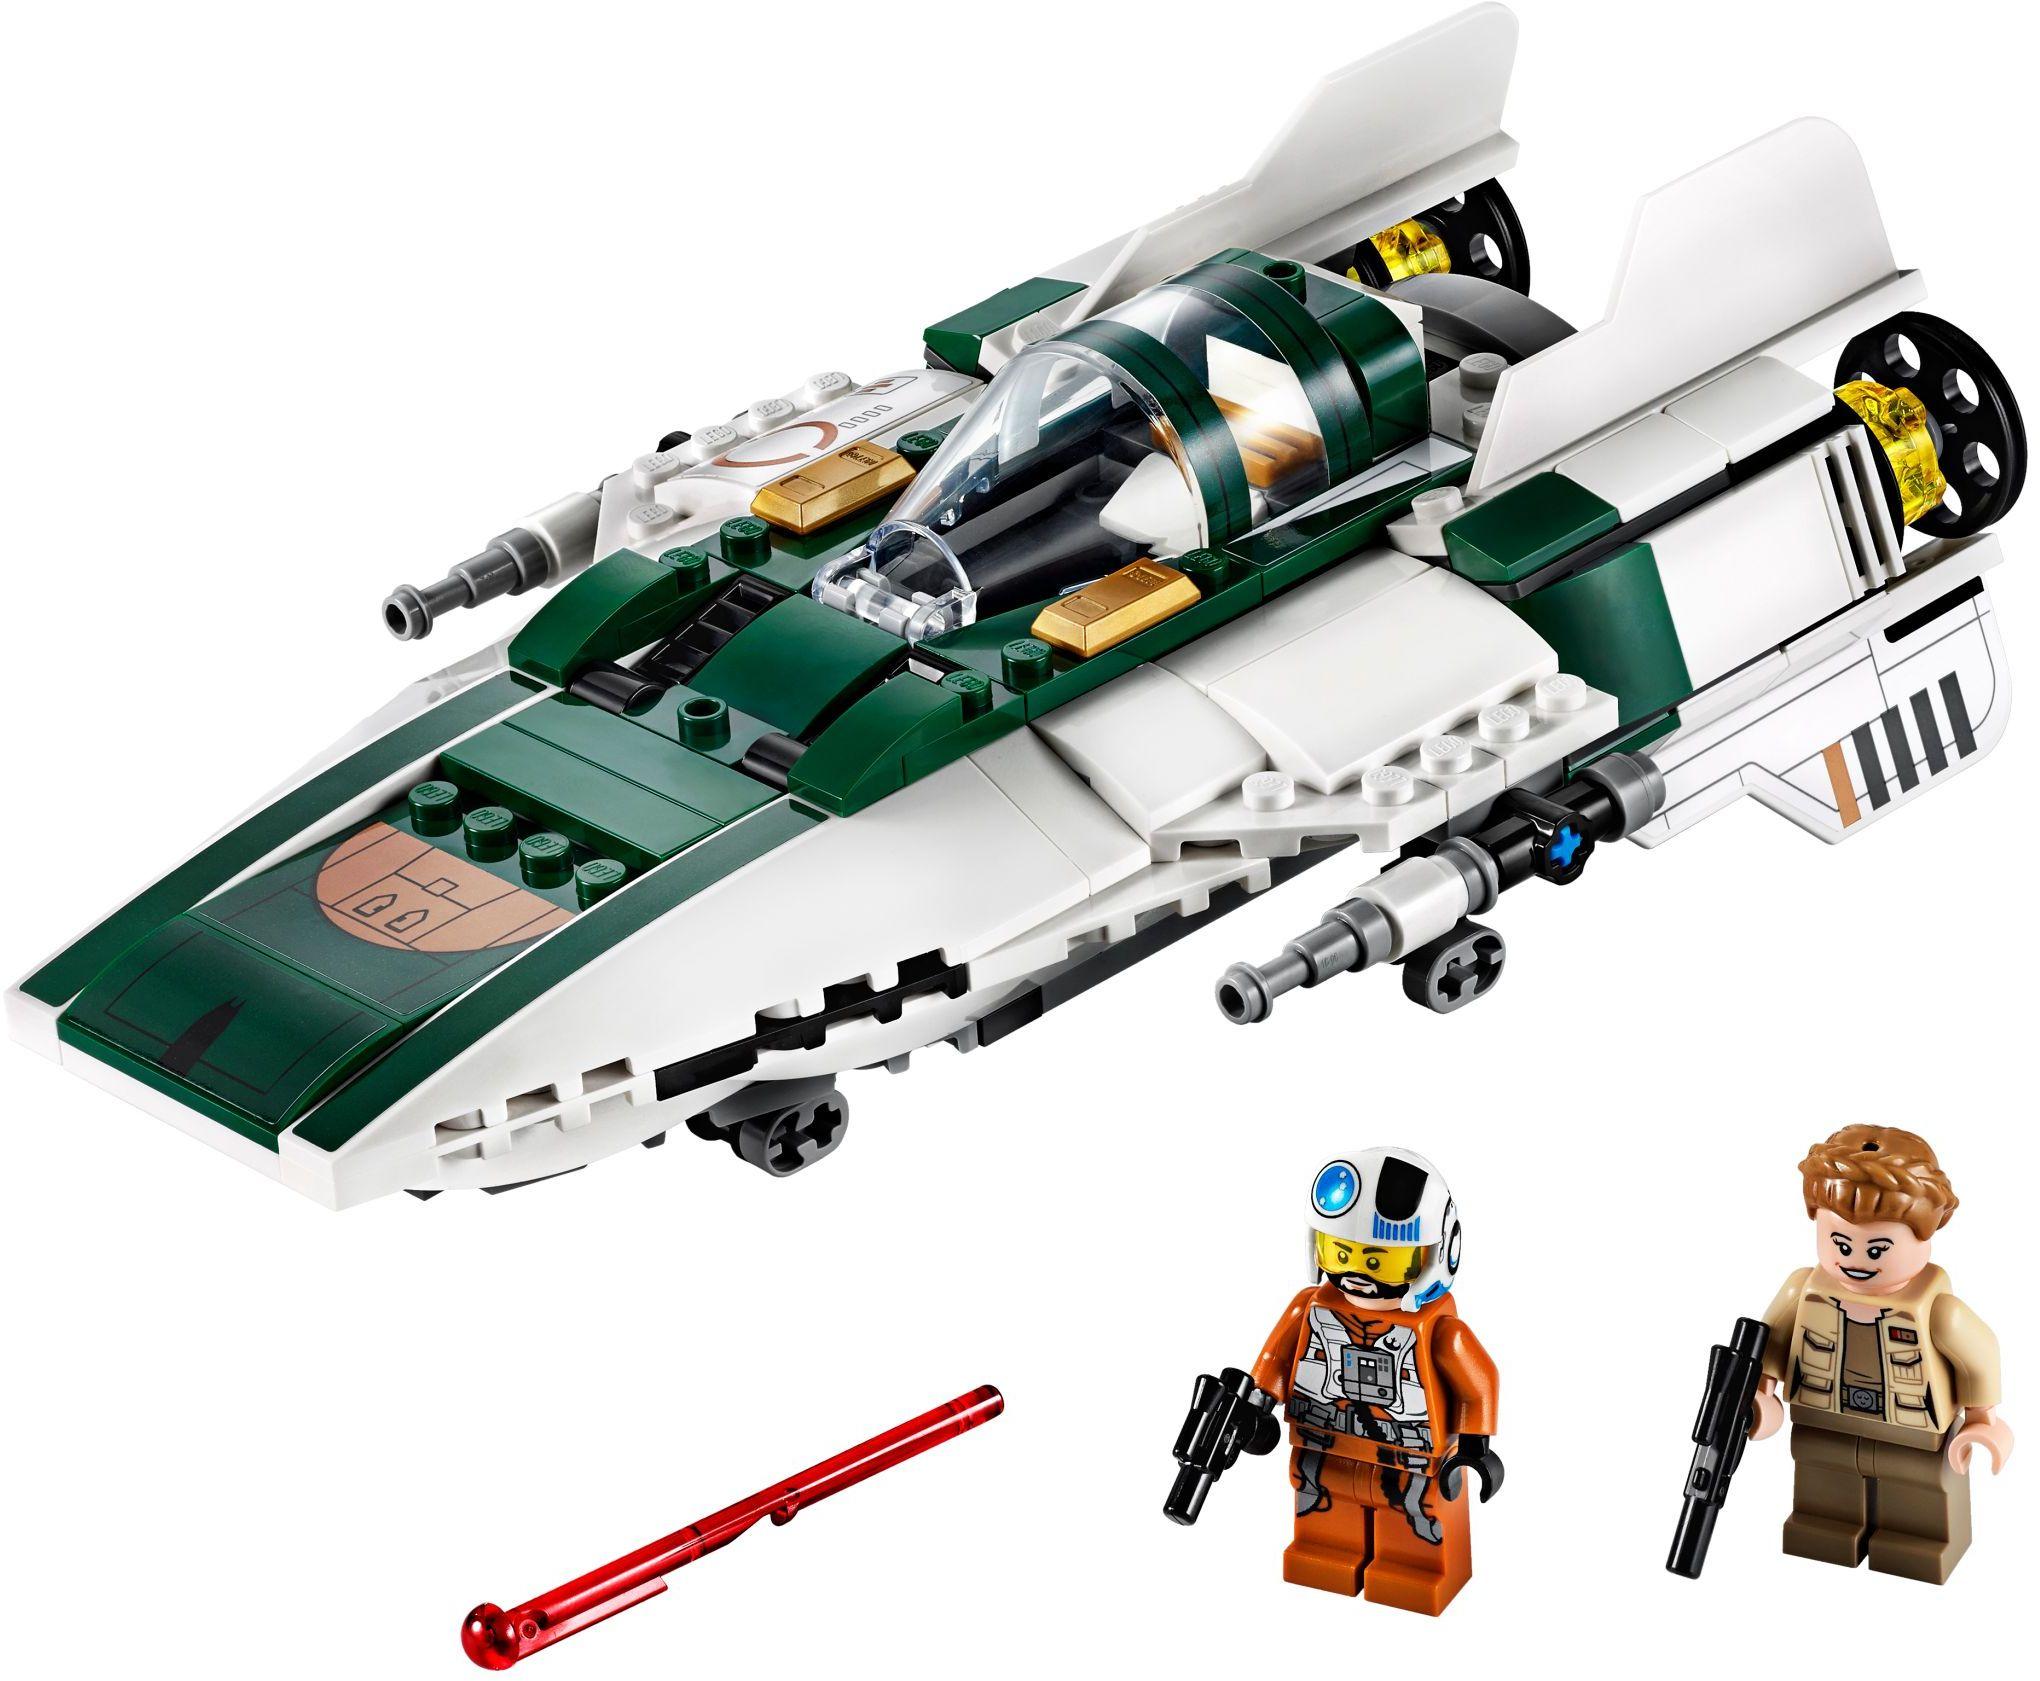 LEGO Rise of Skywalker Sets A-Wing